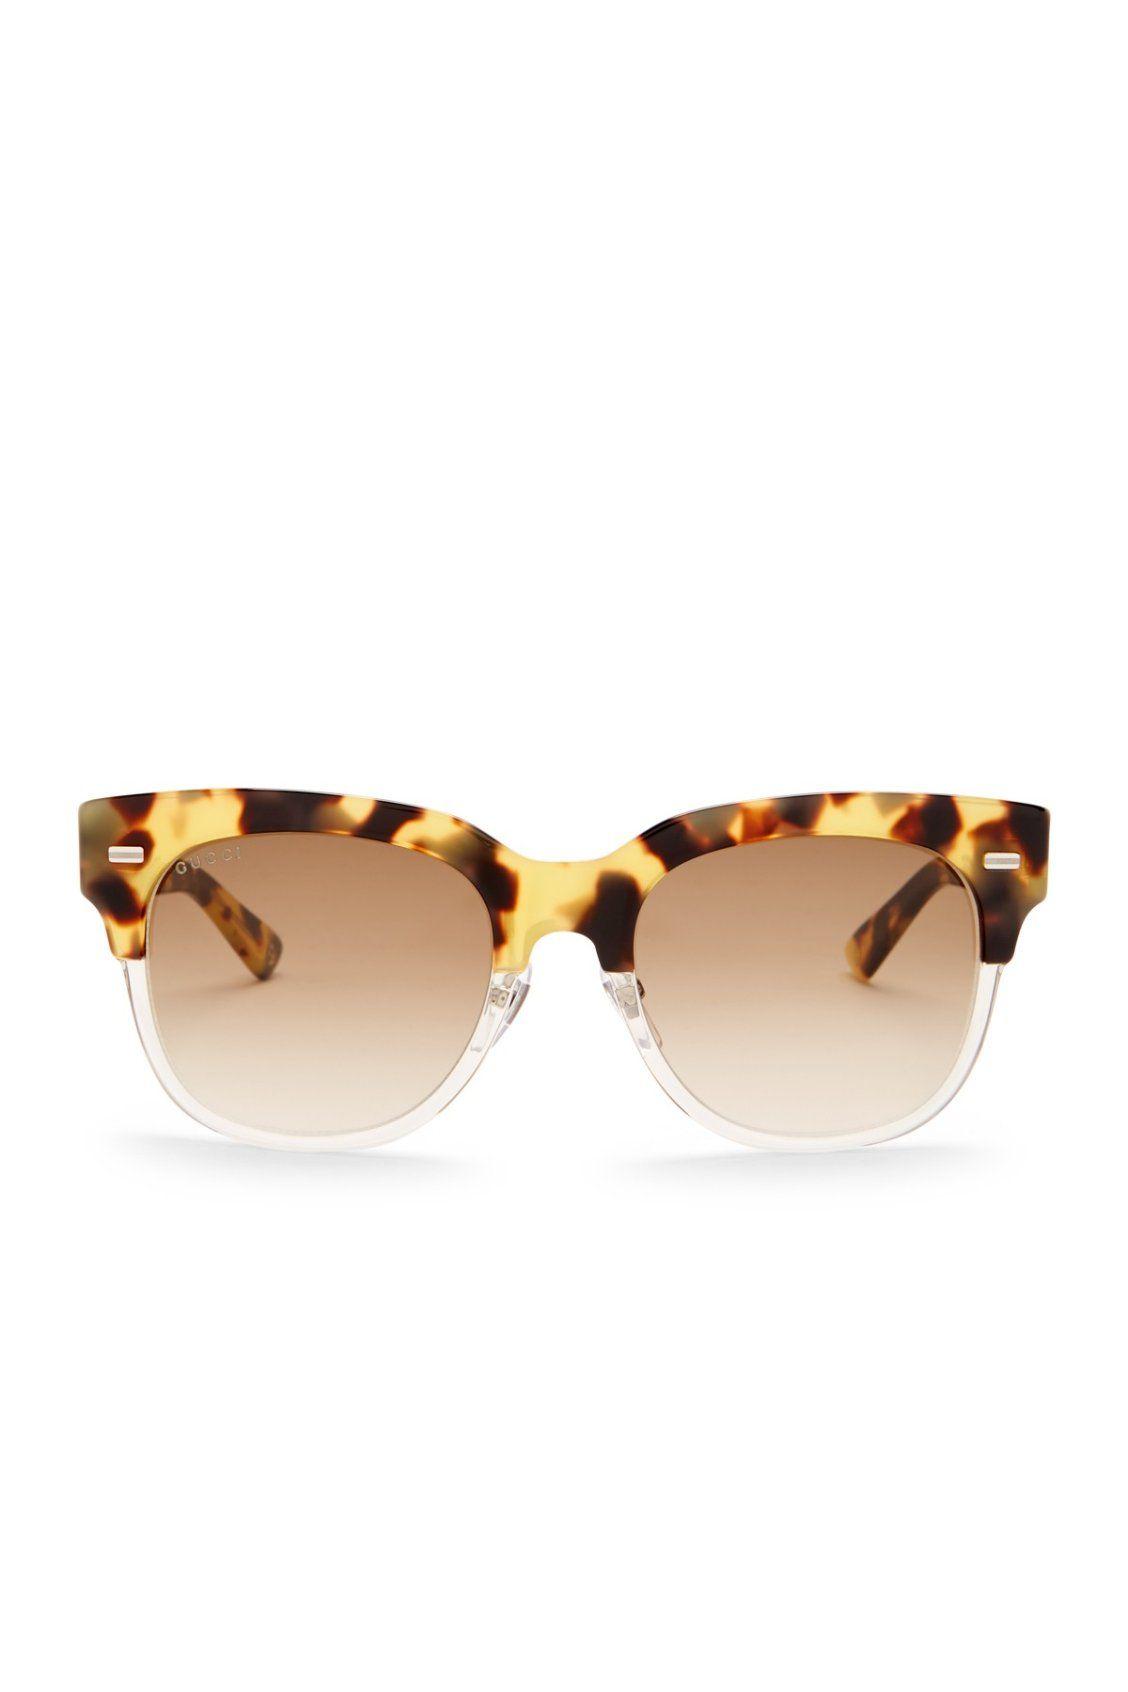 GUCCI Women\'s Clubmaster Acetate Frame Sunglasses   Surf, Sun, Sand ...